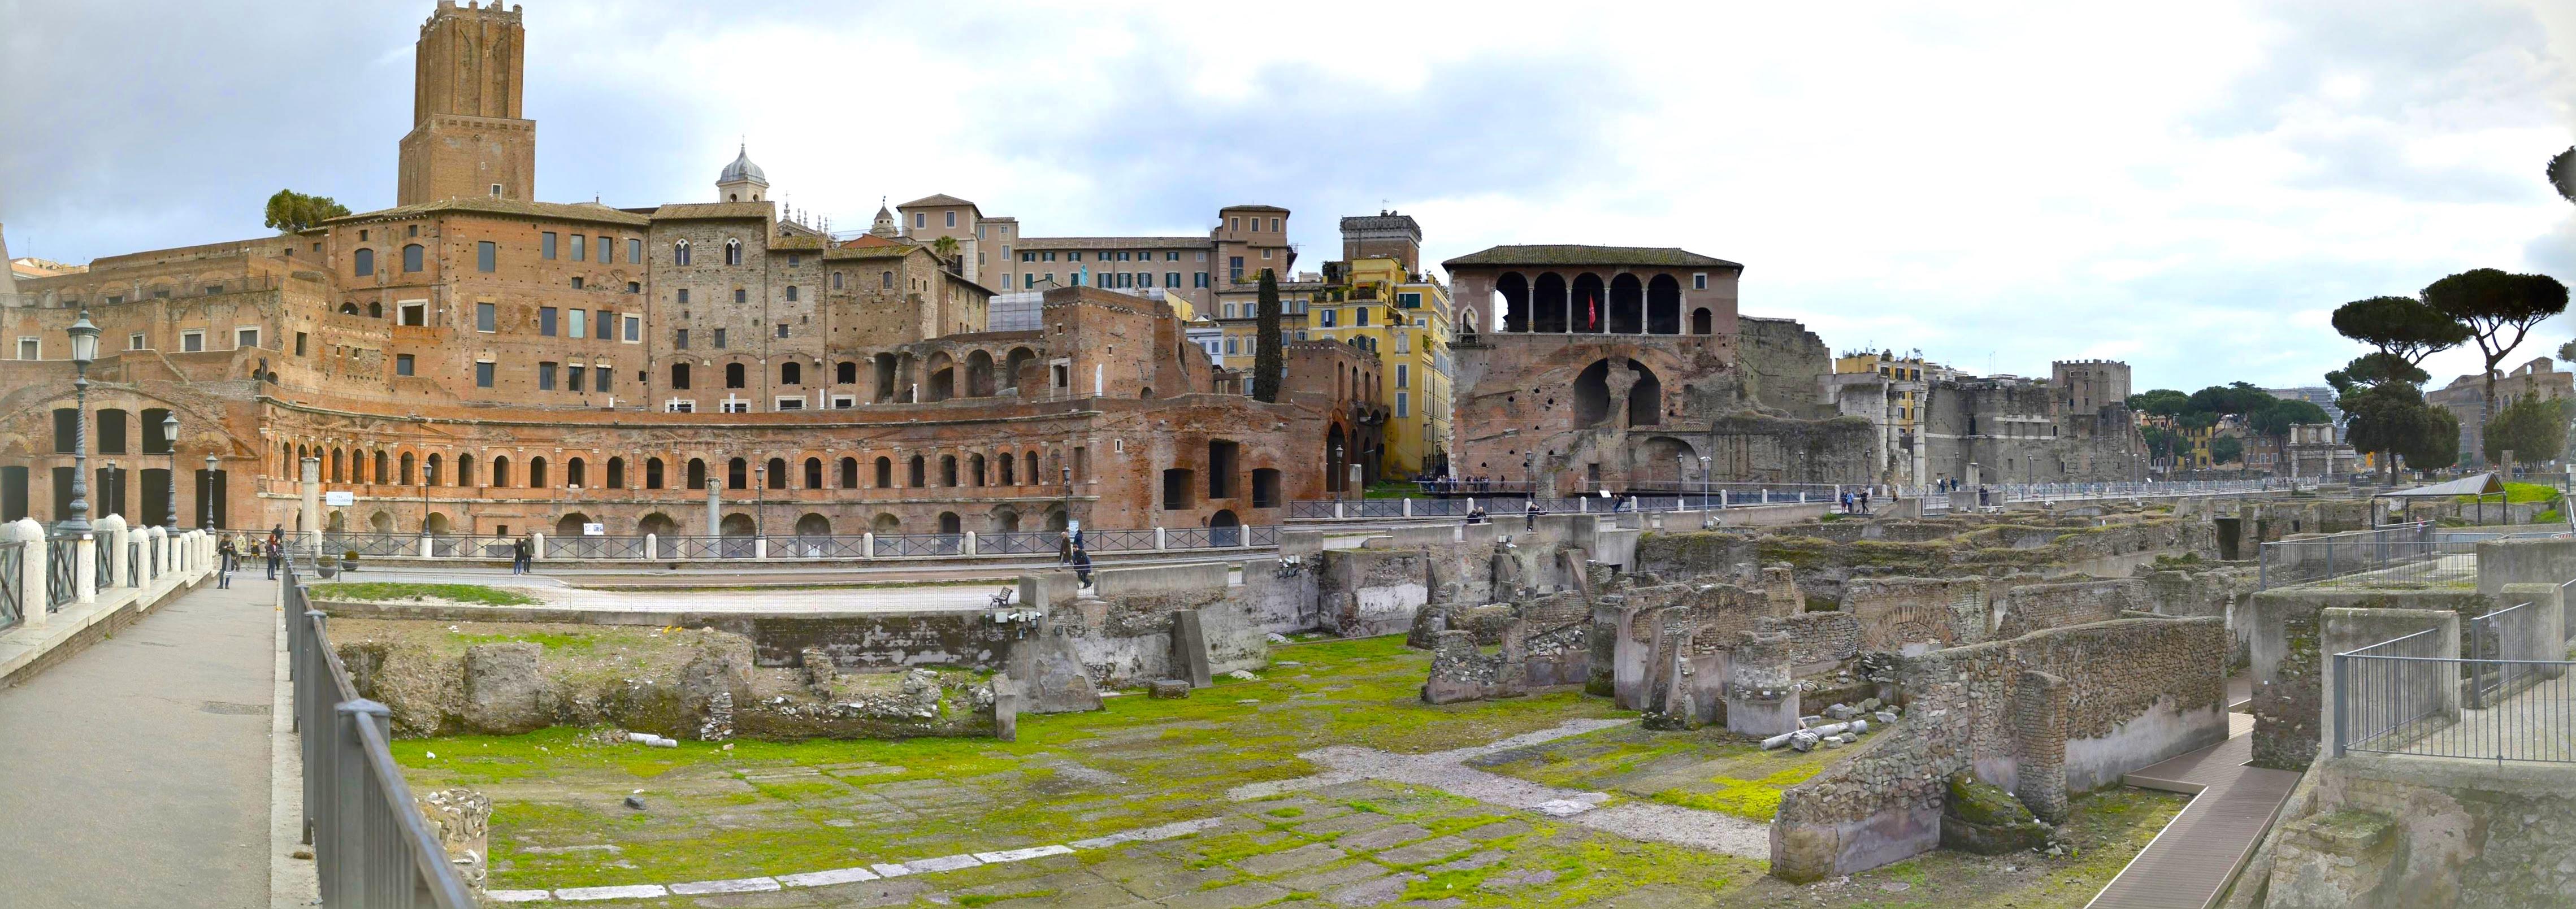 Panorâmica do Foro di Augusto em Roma na Itália